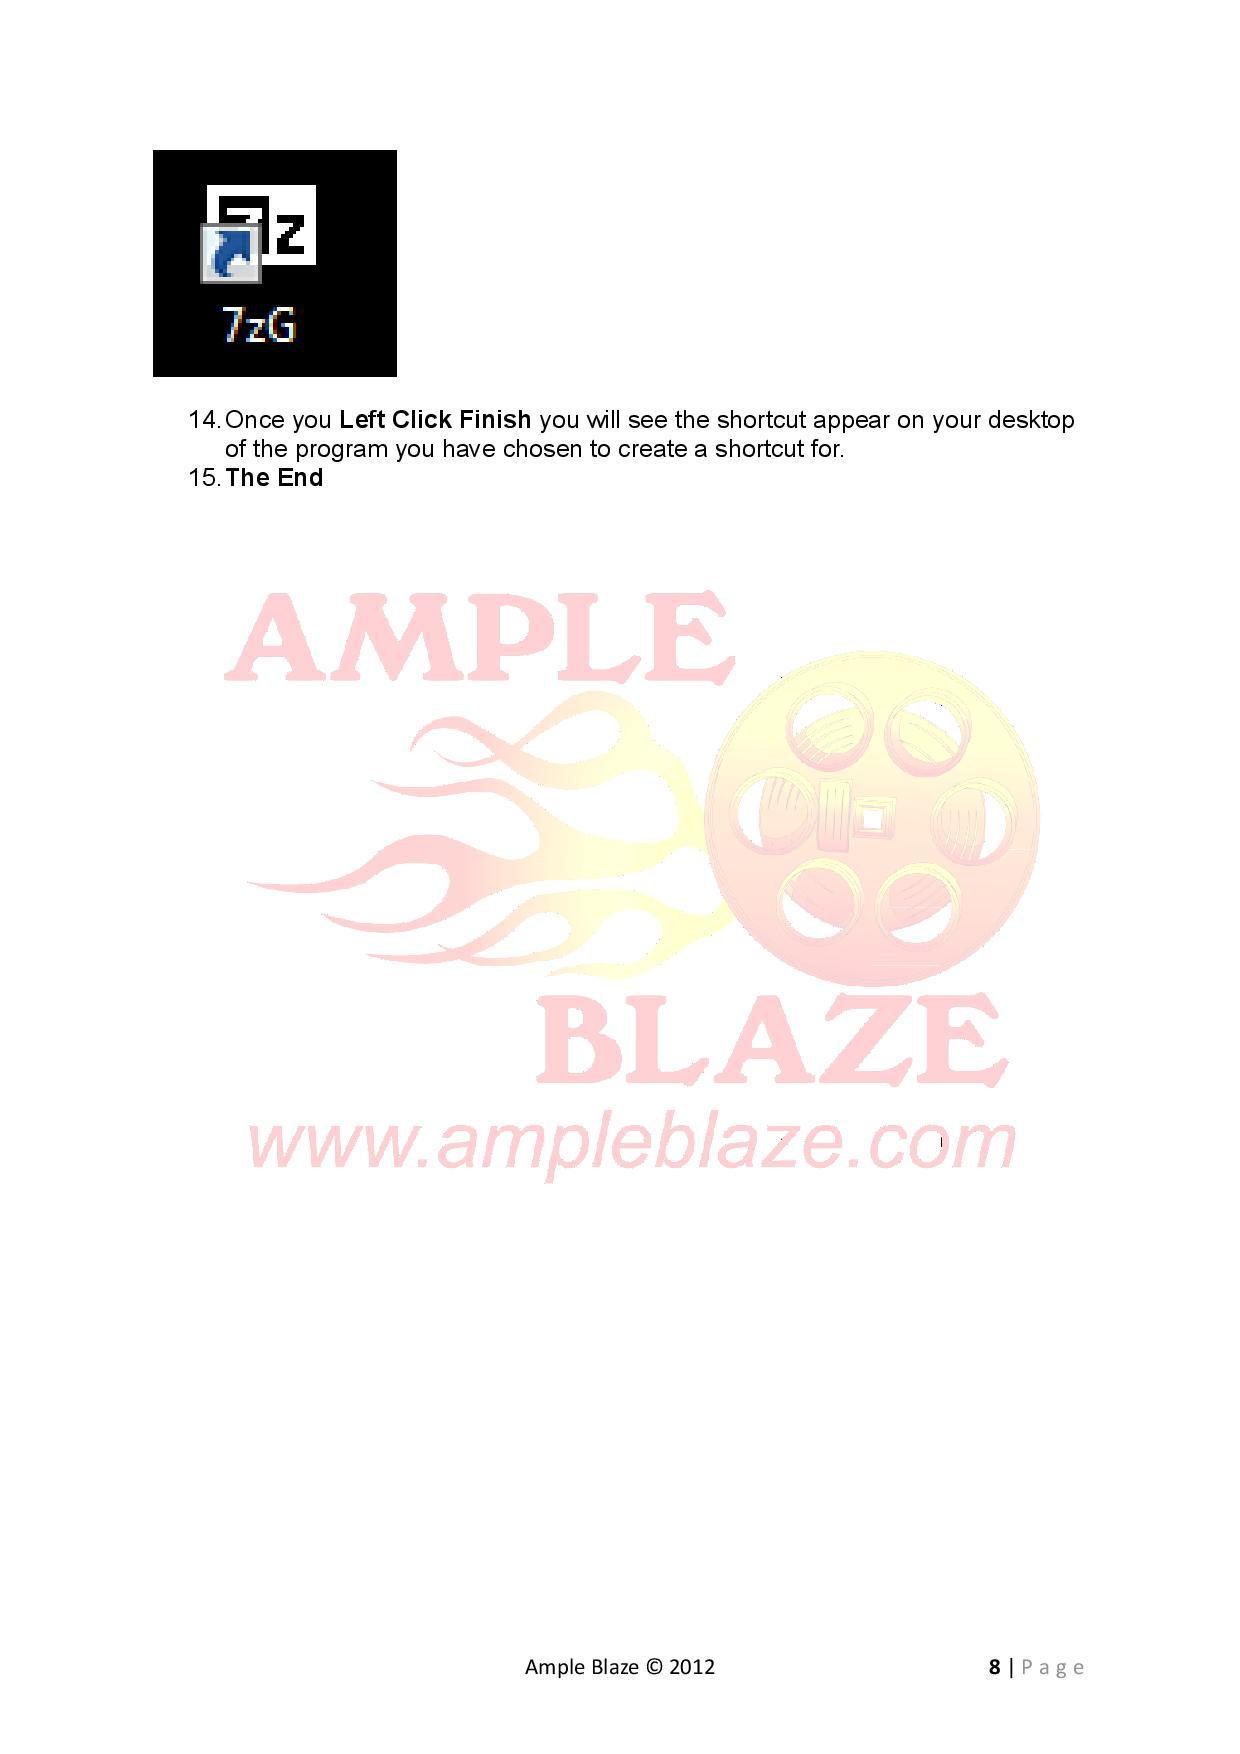 Ample Blaze Create Shortcut Windows 7-page-008